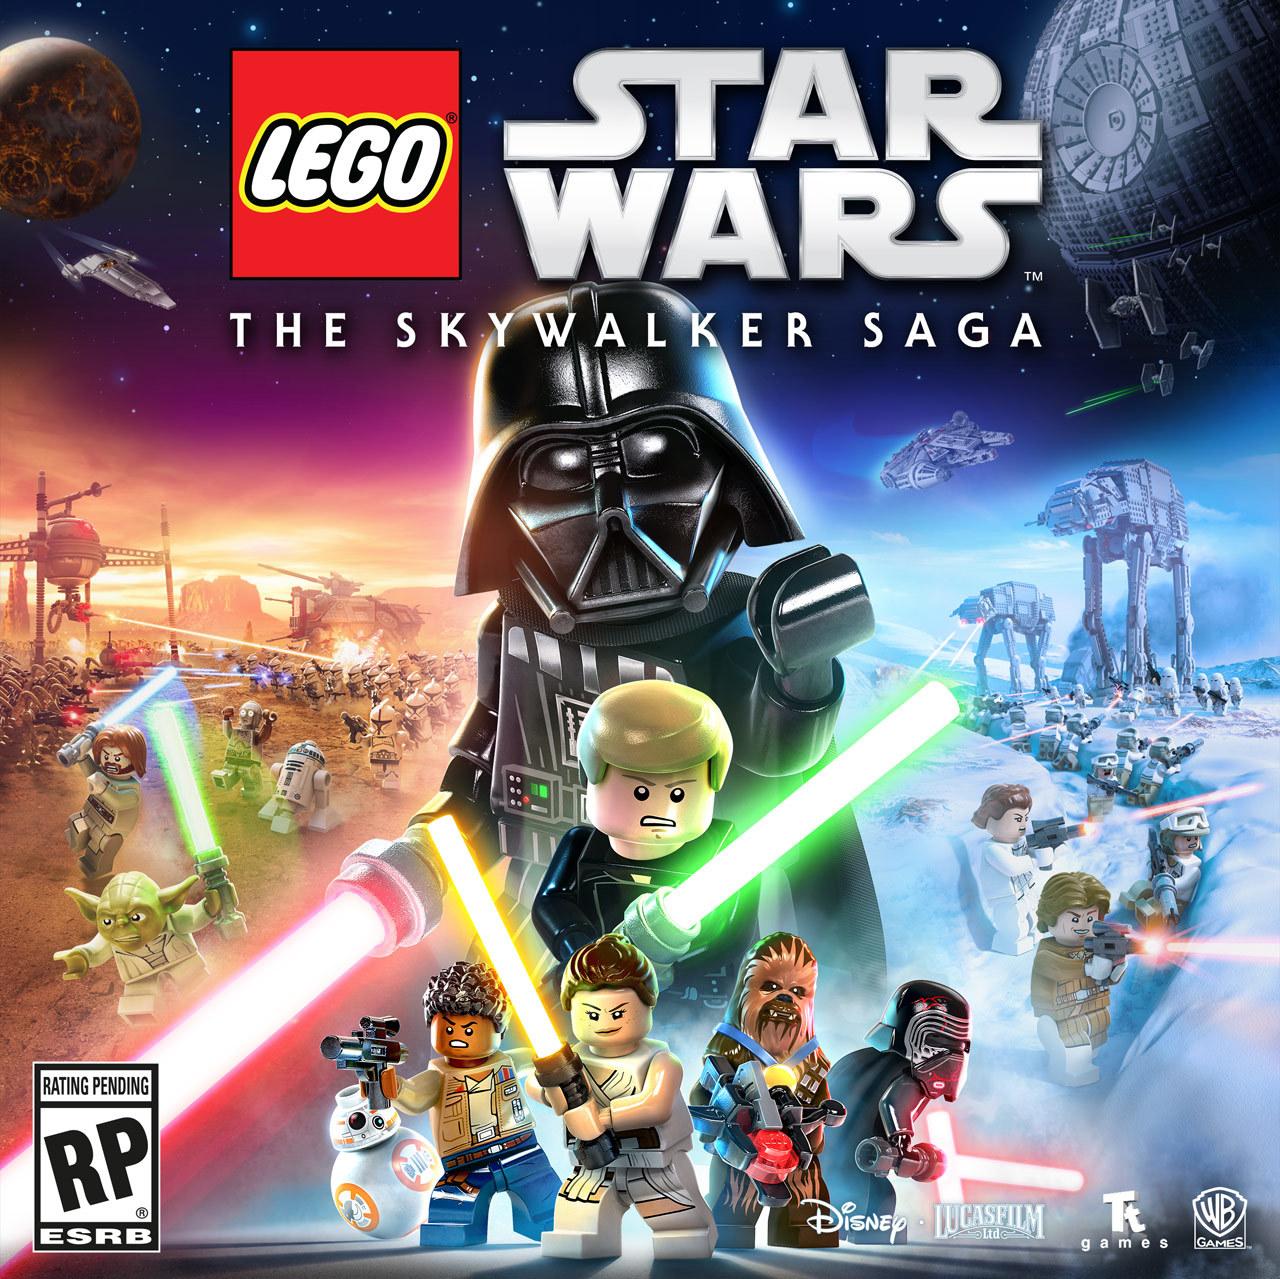 Official box art for Lego Star Wars: The Skywalker Saga